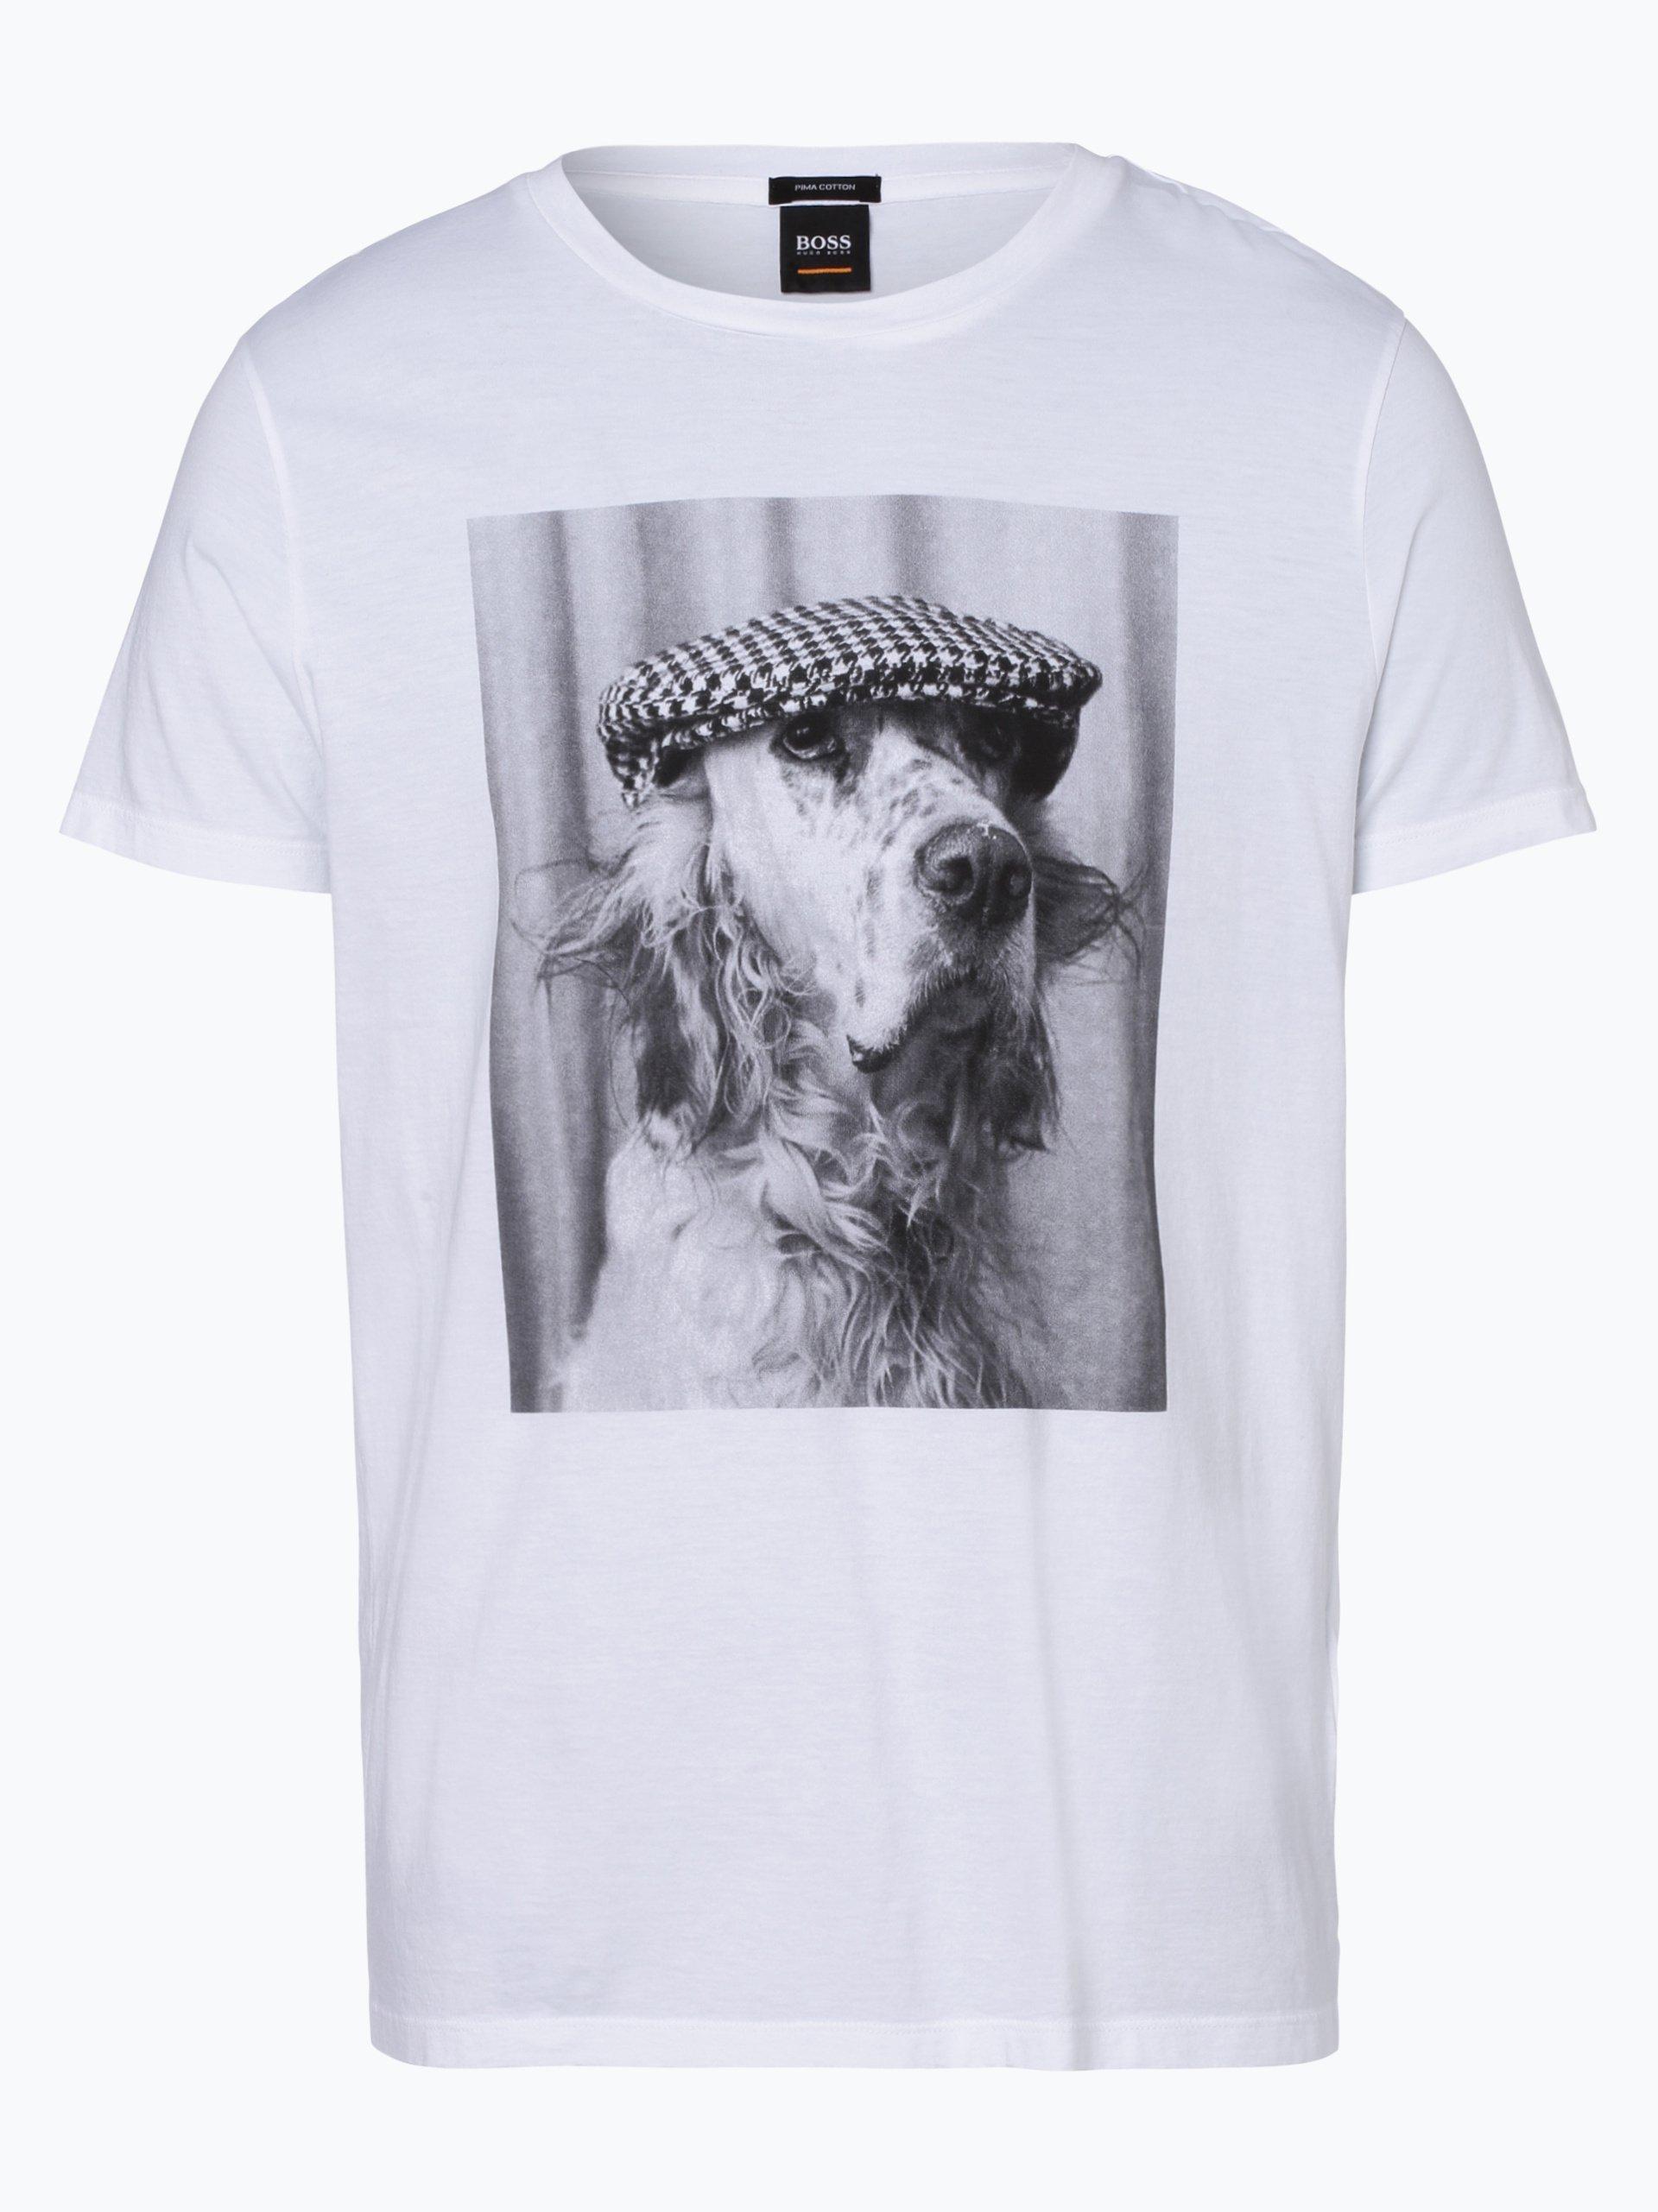 BOSS Casual T-shirt męski – Teedog 2